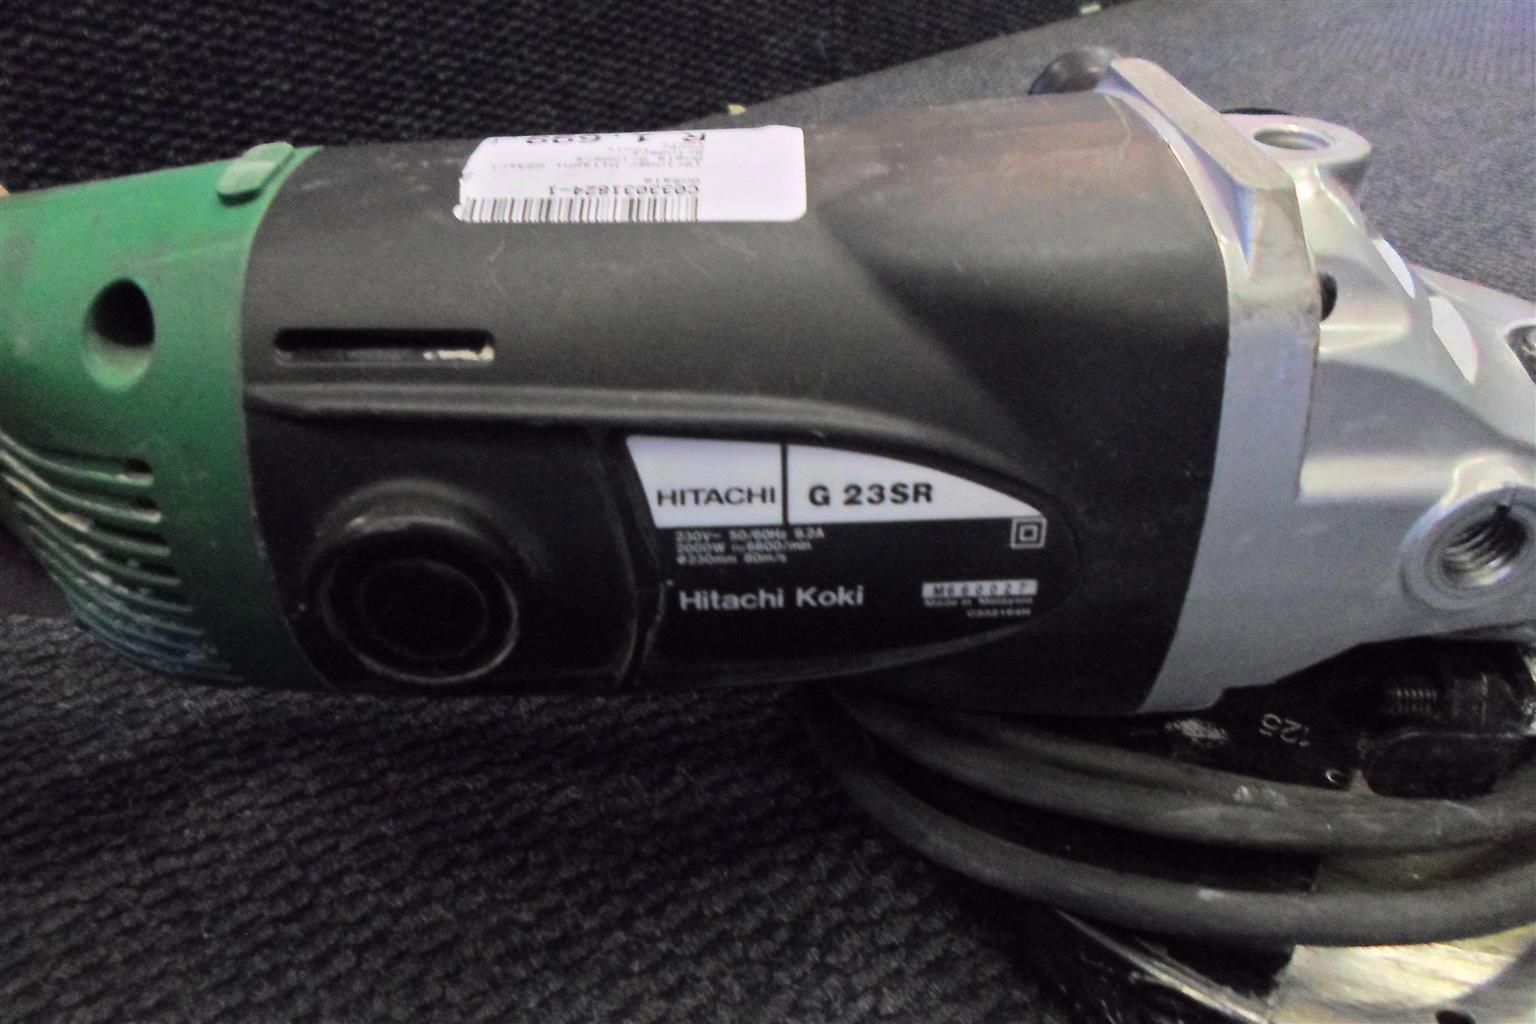 2000W G 23SR Hitachi Angle Grinder C033031824-1